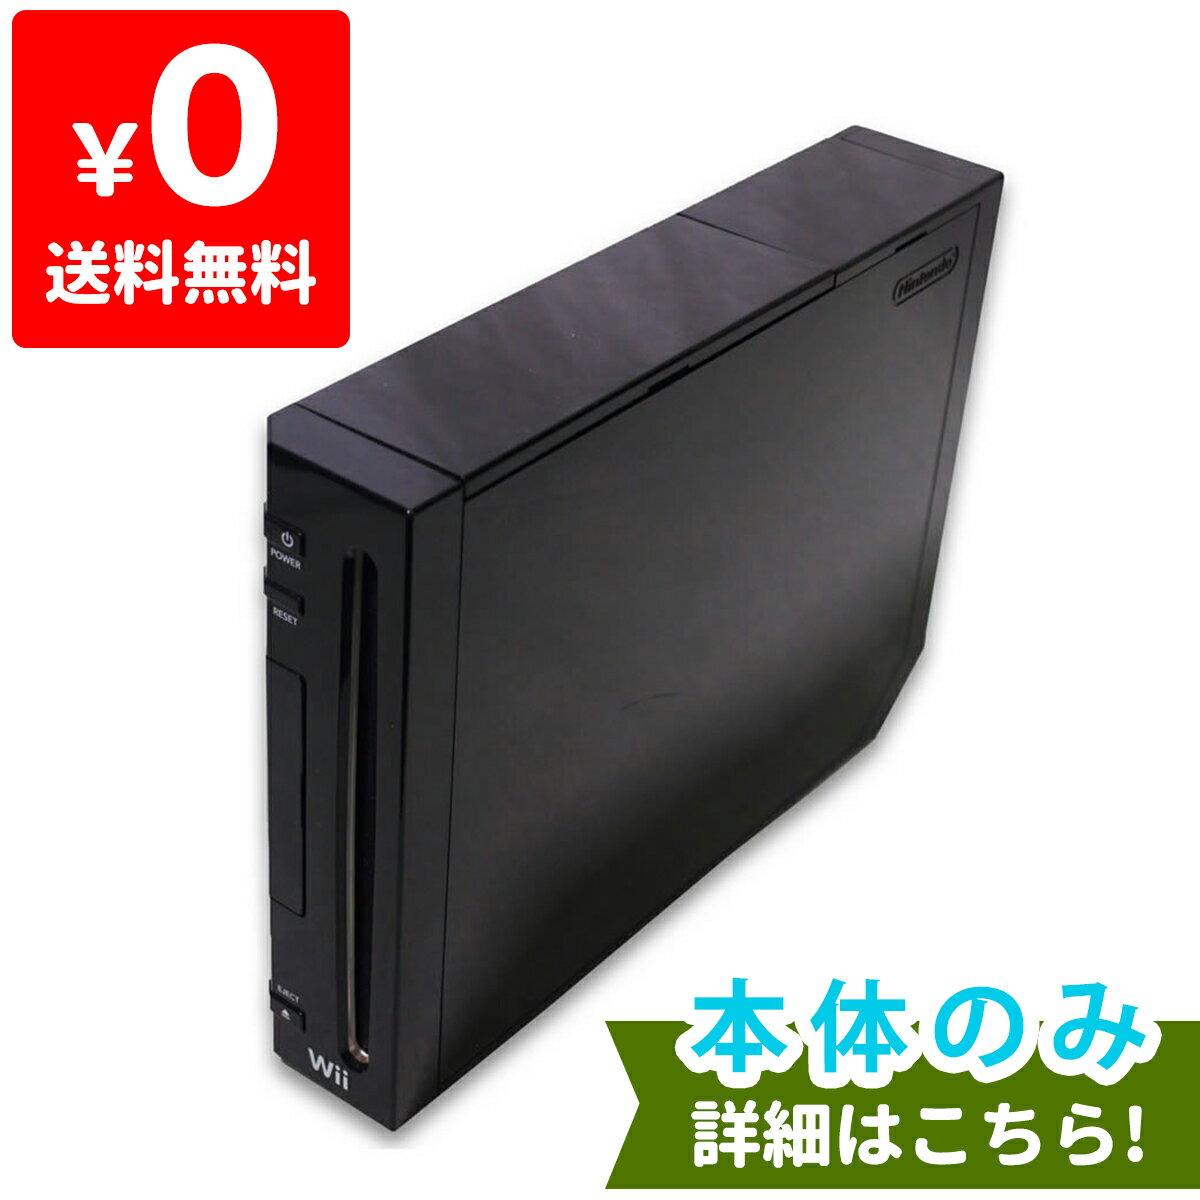 Wii ウィー 本体のみ クロ 黒 ニンテンドー 任天堂 Nintendo 中古 4902370517811 送料無料 【中古】